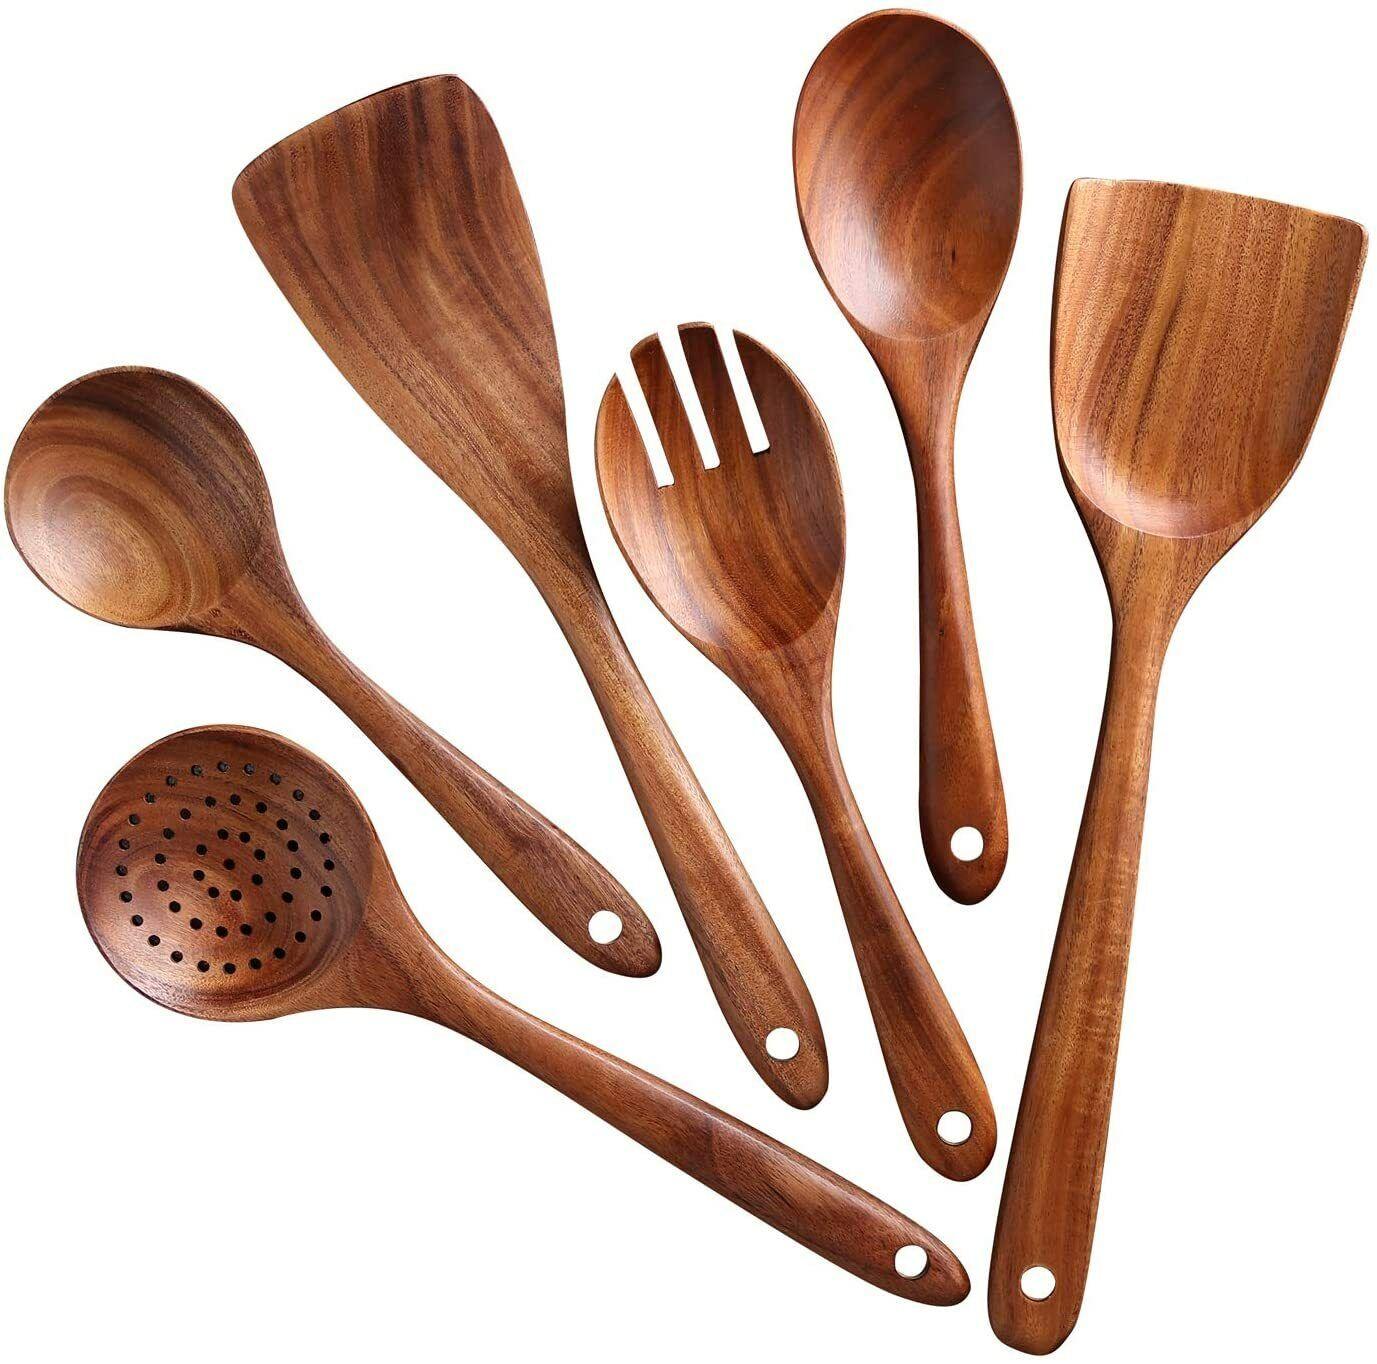 Wooden Cooking Utensil Set Non-stick Pan Kitchen Tool Wooden Salad Cooking Set